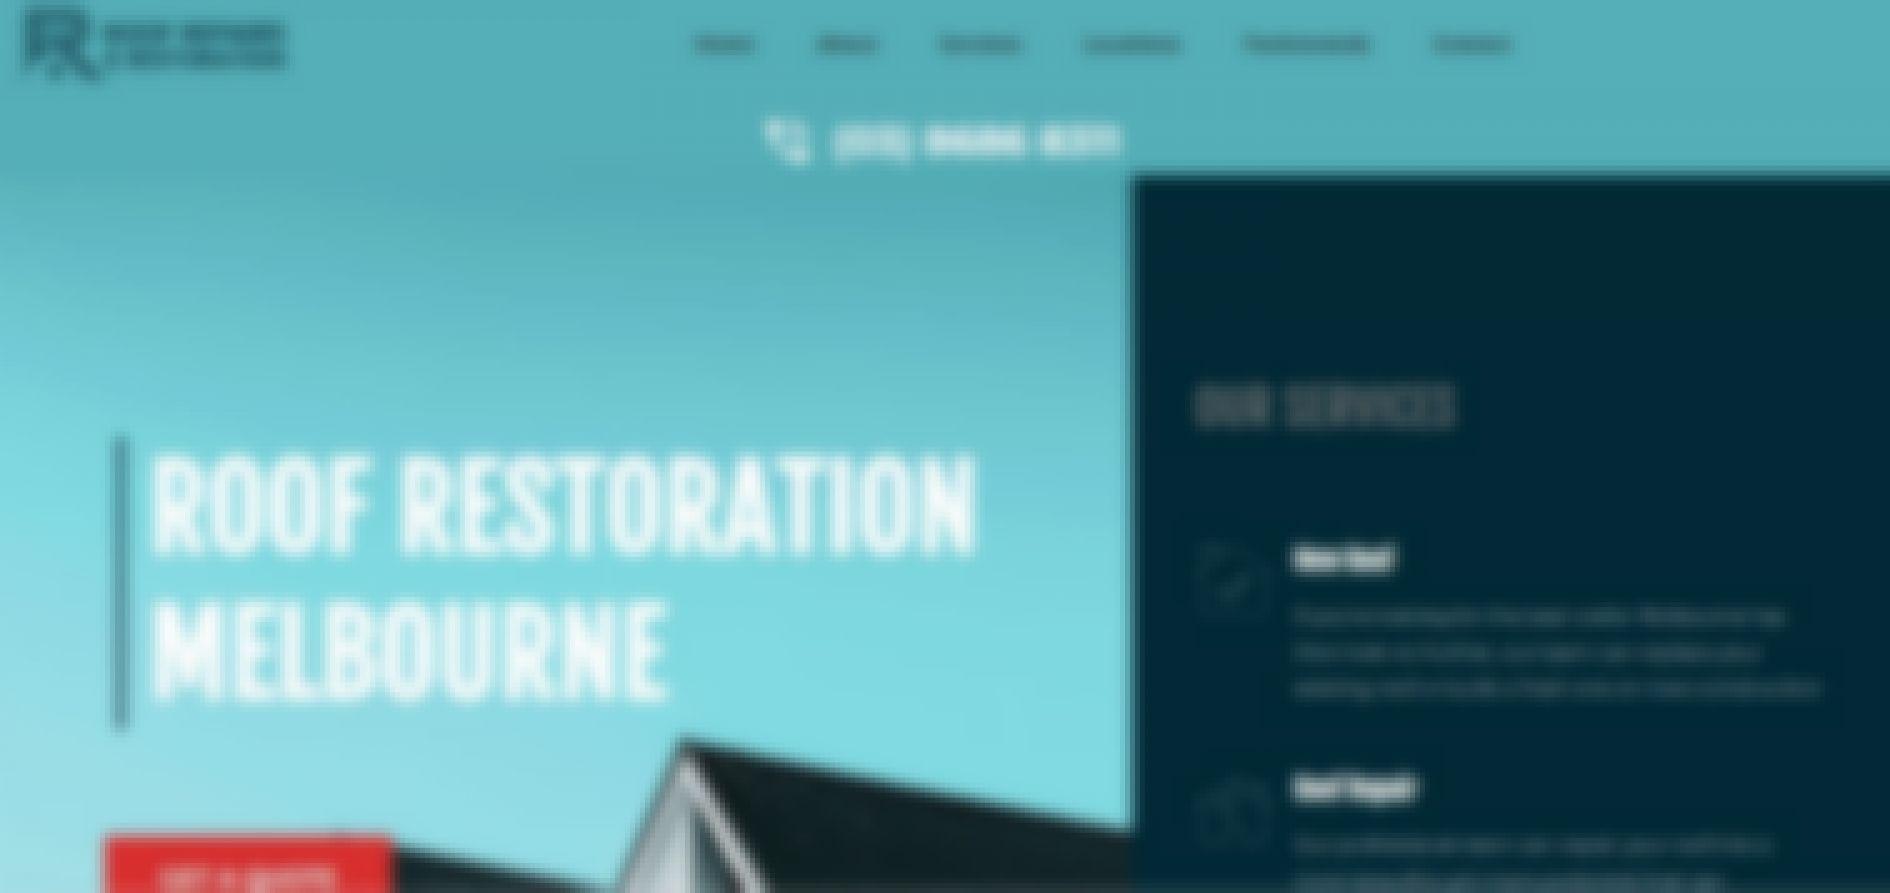 roof repairs & restoration